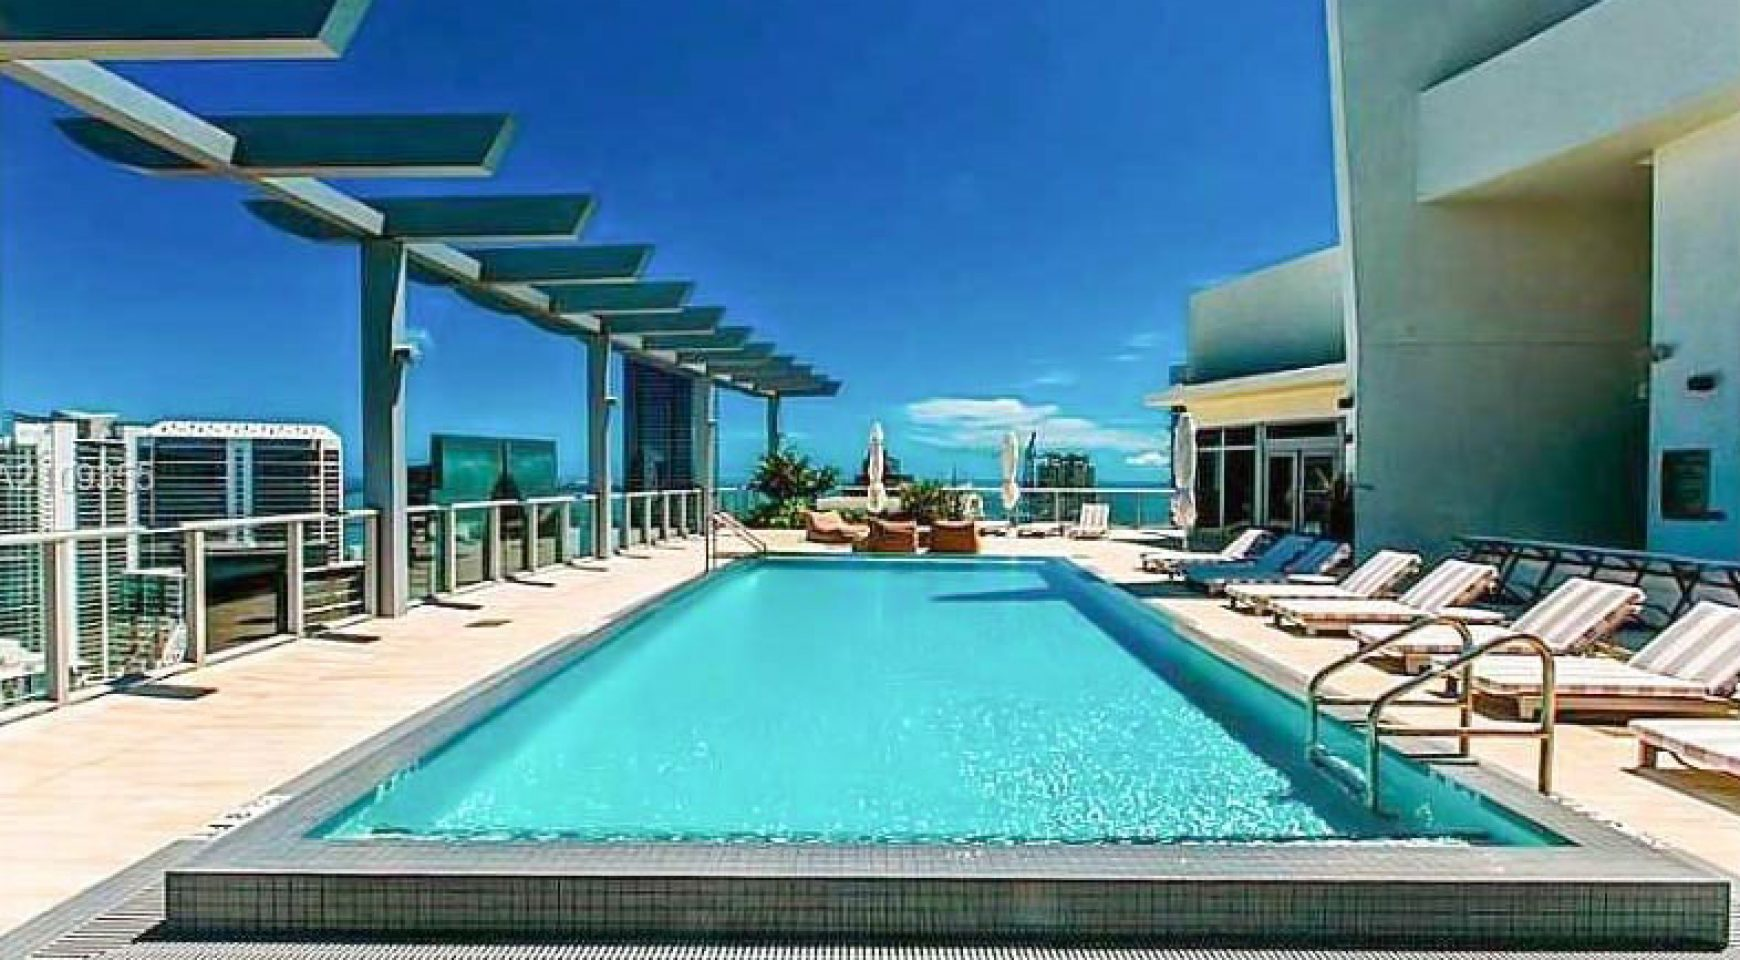 Apartamento en venta 1100 S Miami Ave Brickell, Miami, FL | | Golod ...